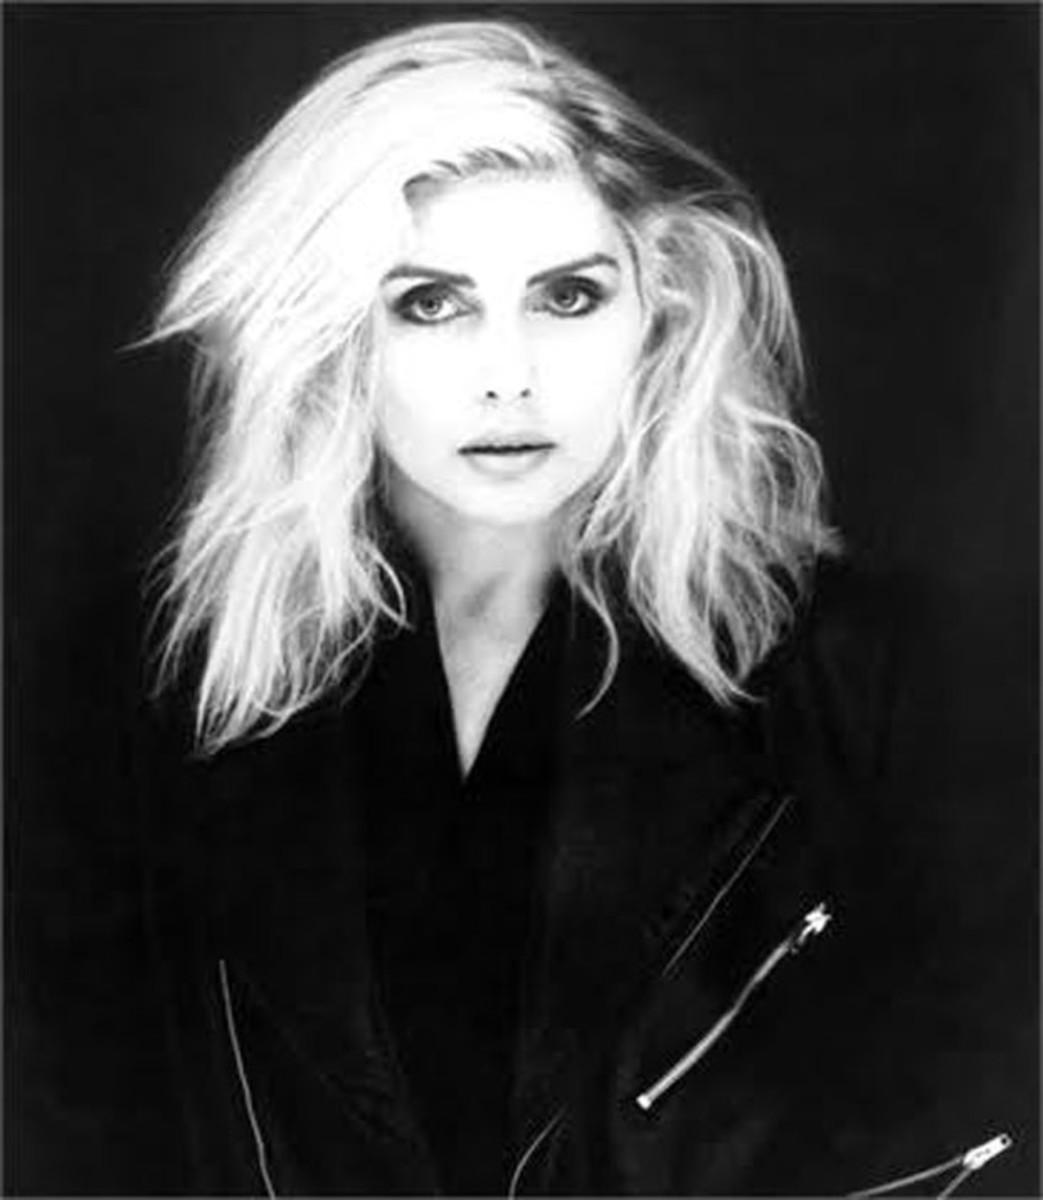 Debbie Harry layered hair